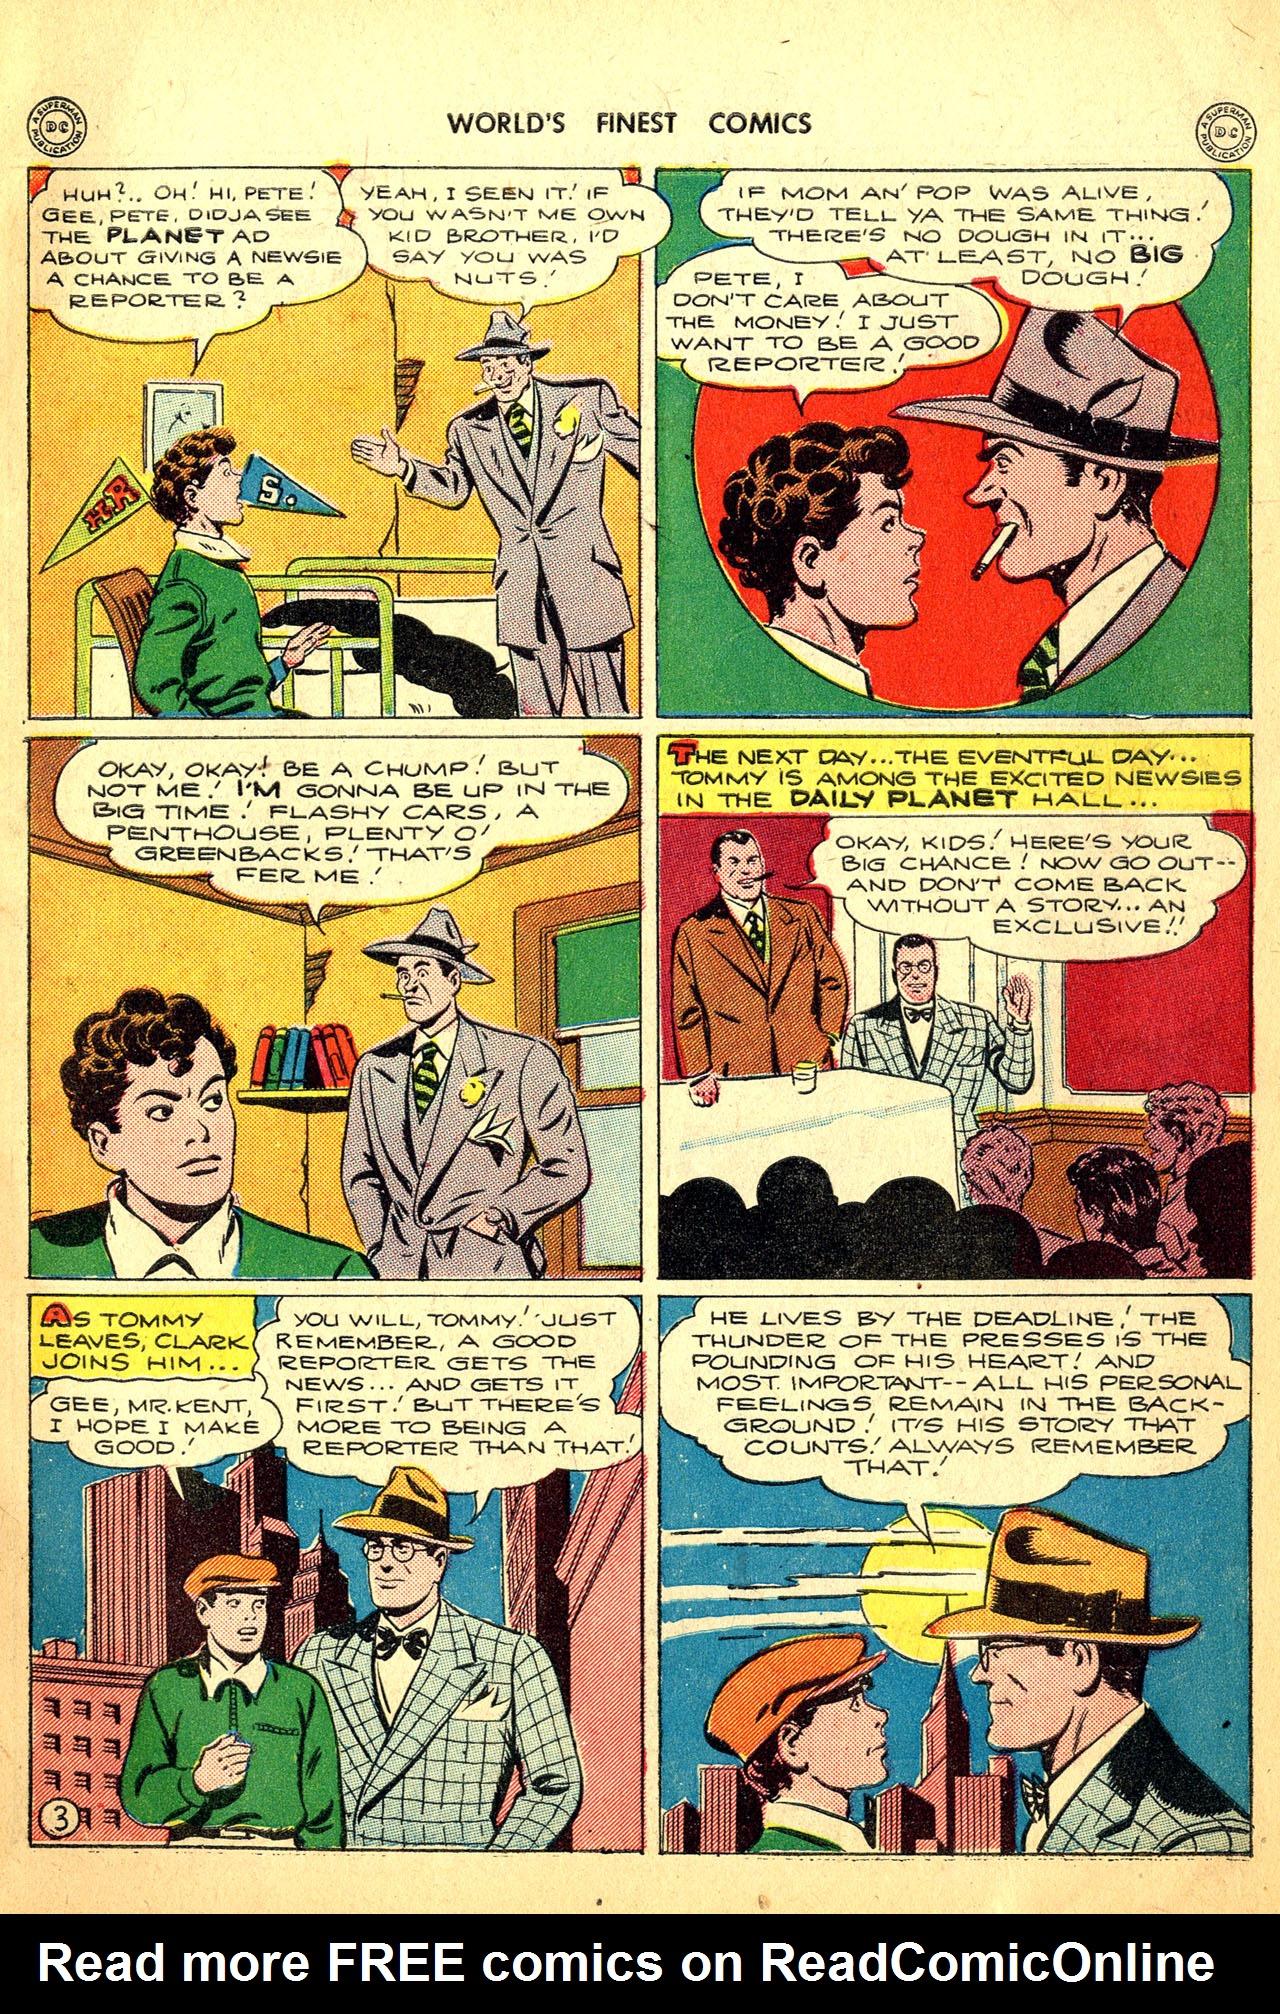 Read online World's Finest Comics comic -  Issue #18 - 5